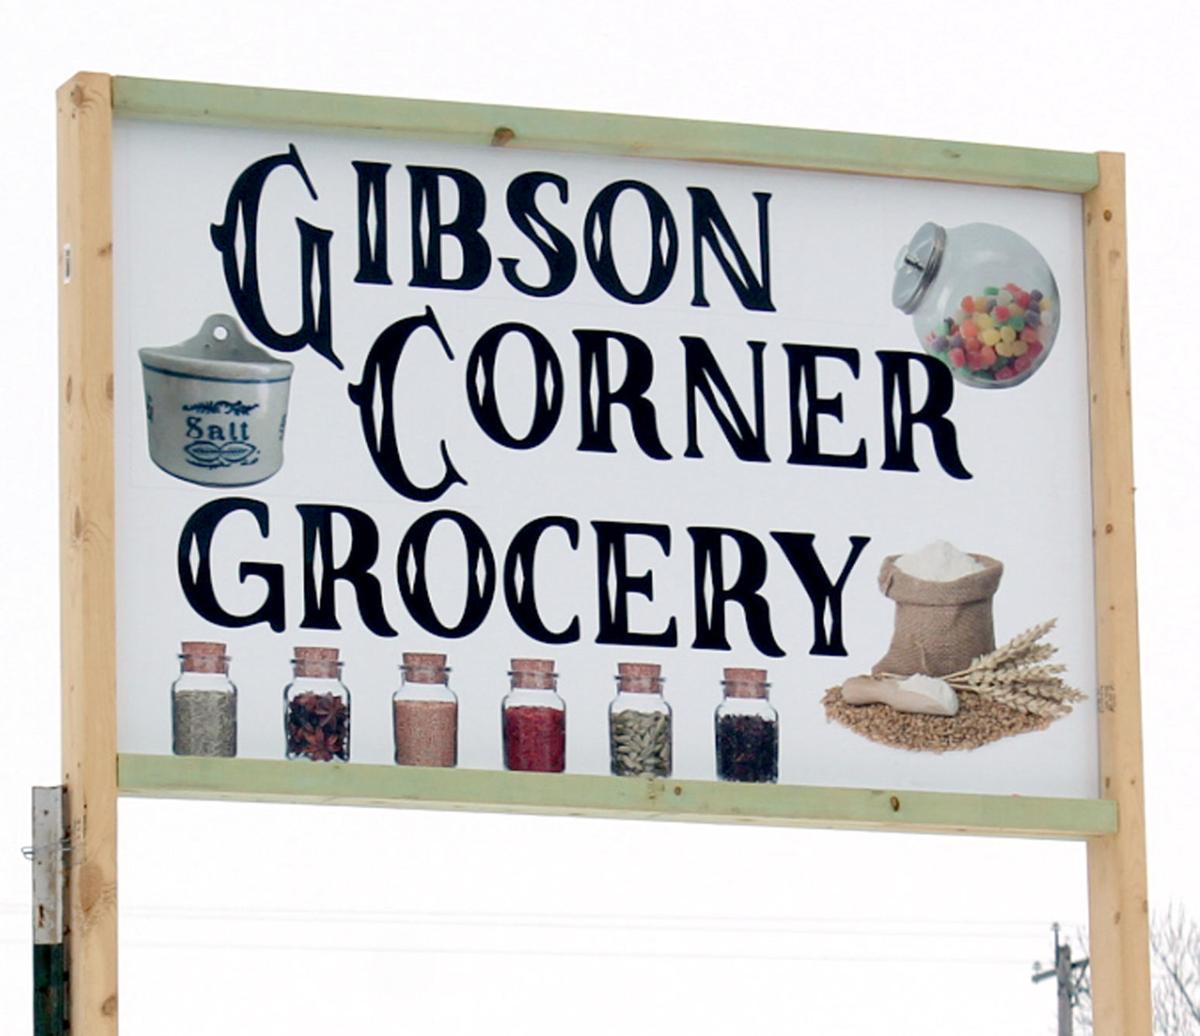 Gibson Corner Grocery